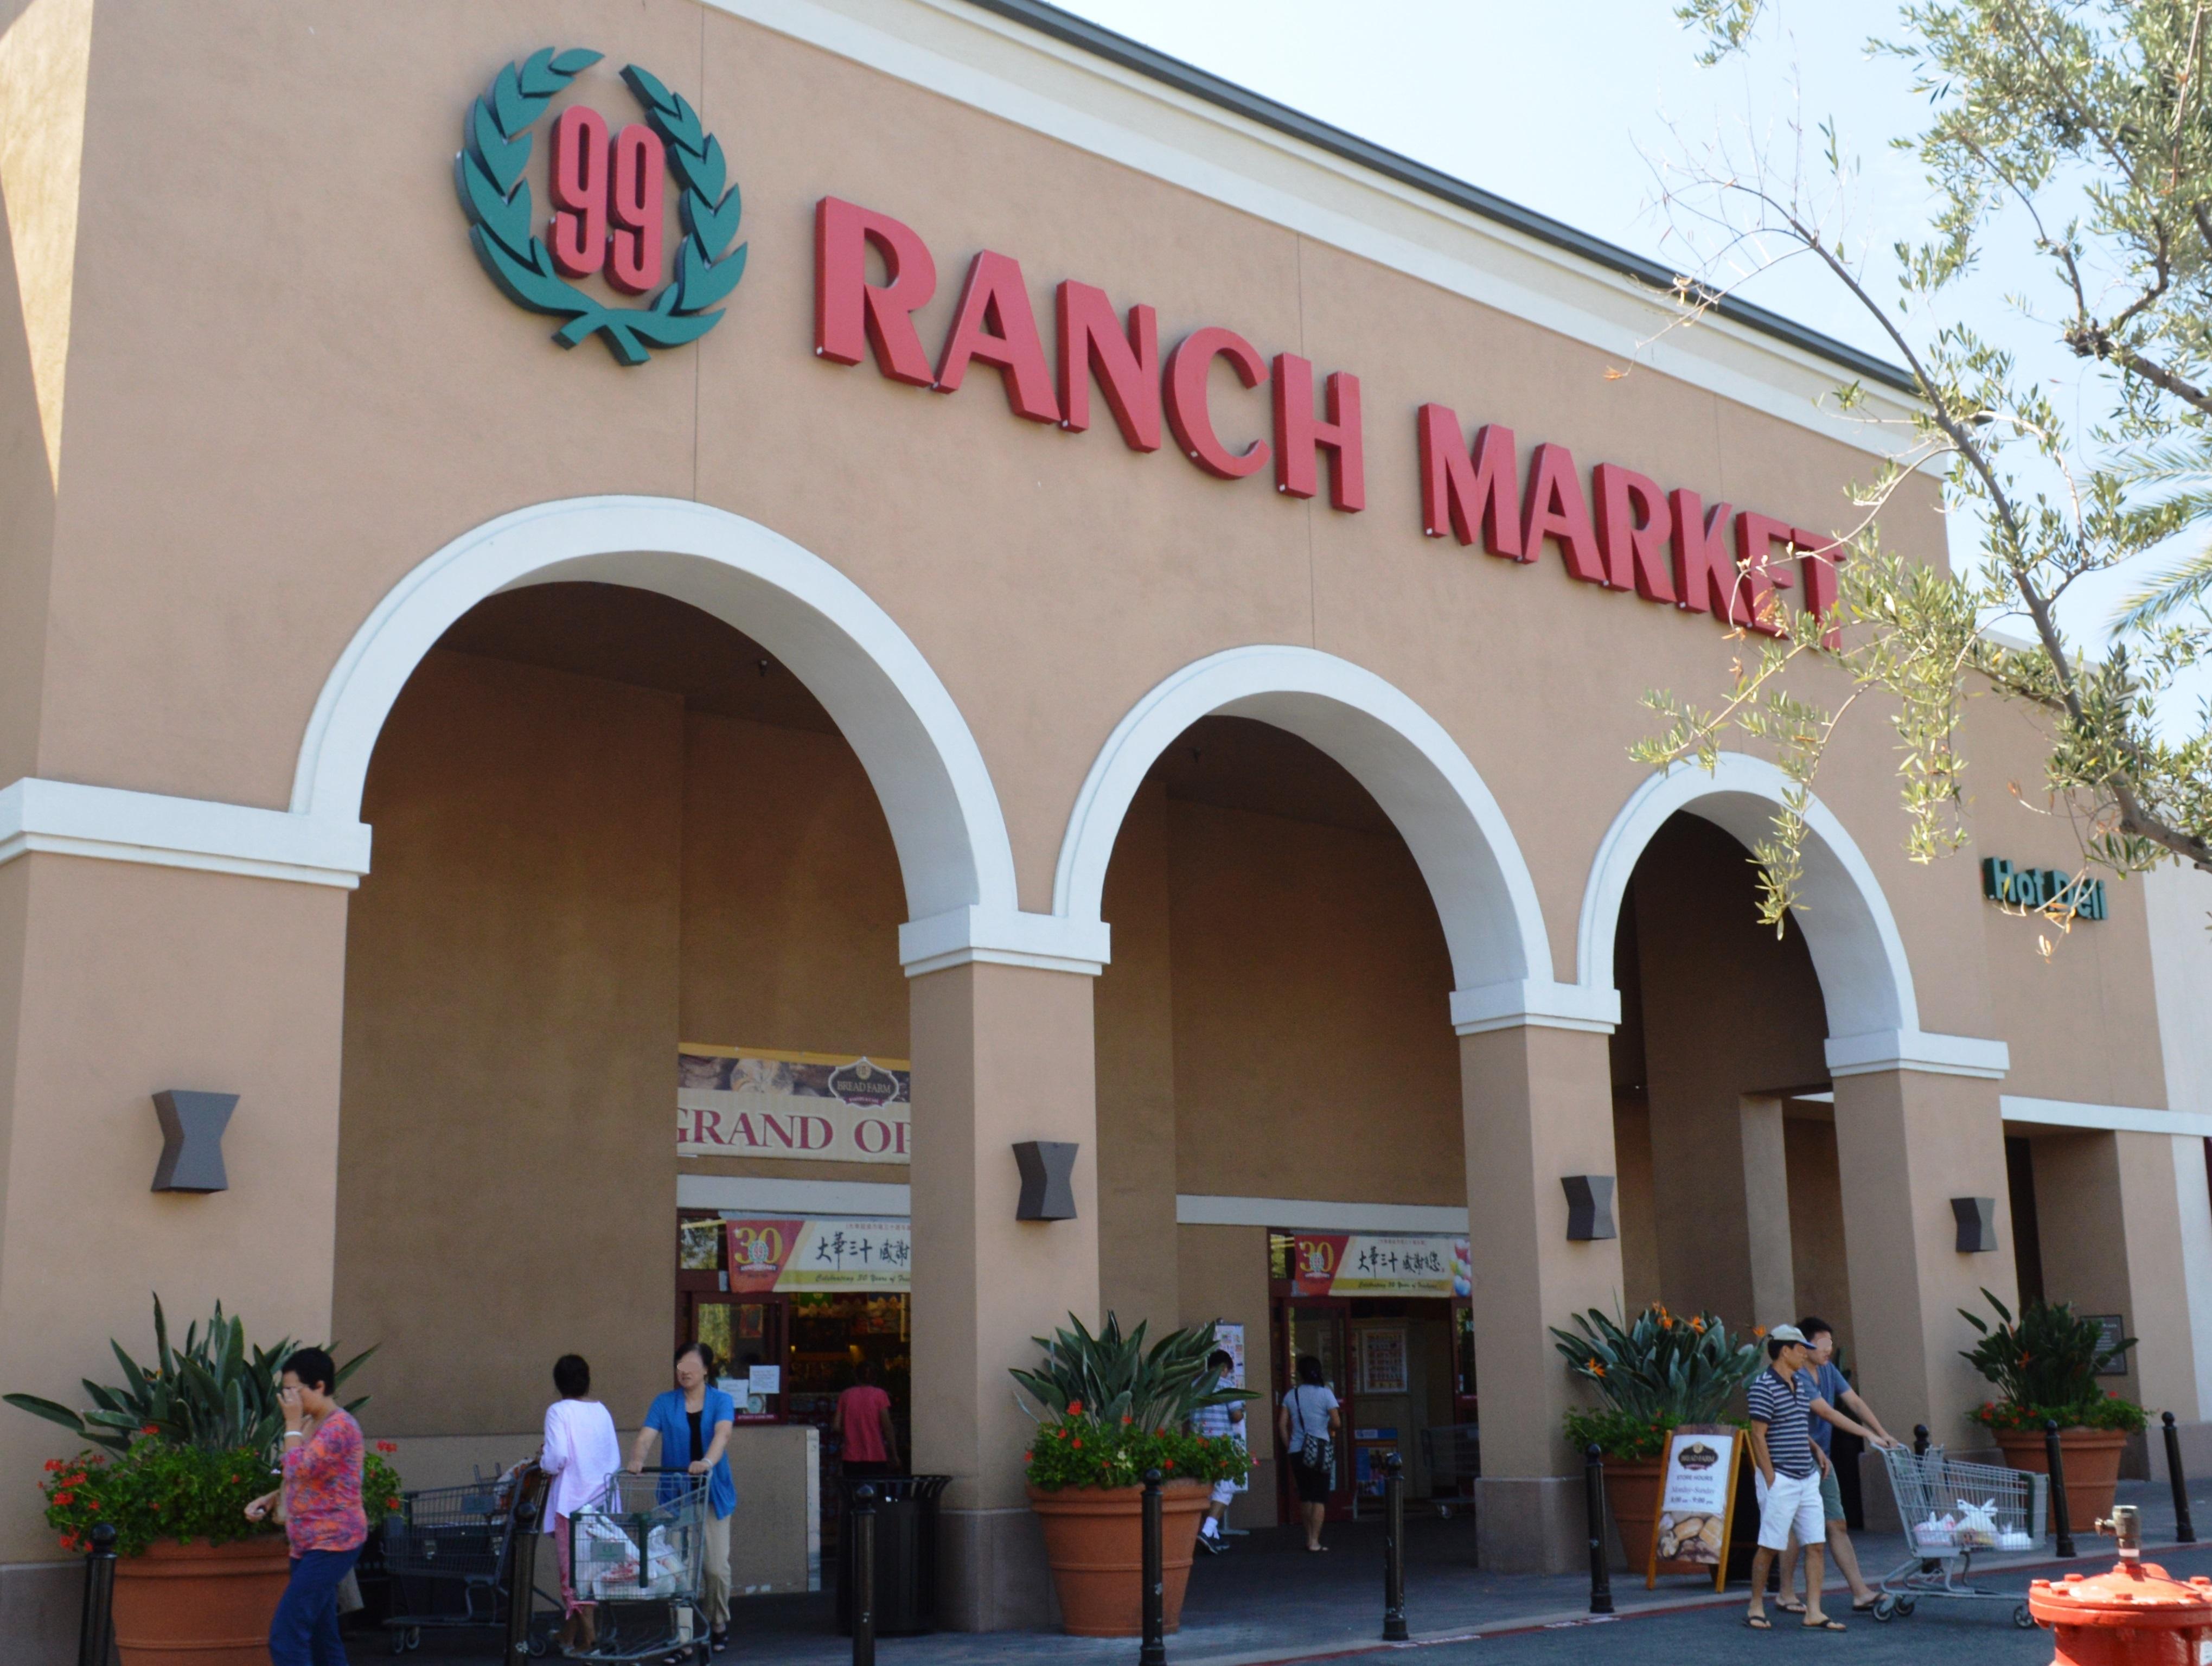 File20140809 0087 Irvine 99 Ranch Market CulverJPG